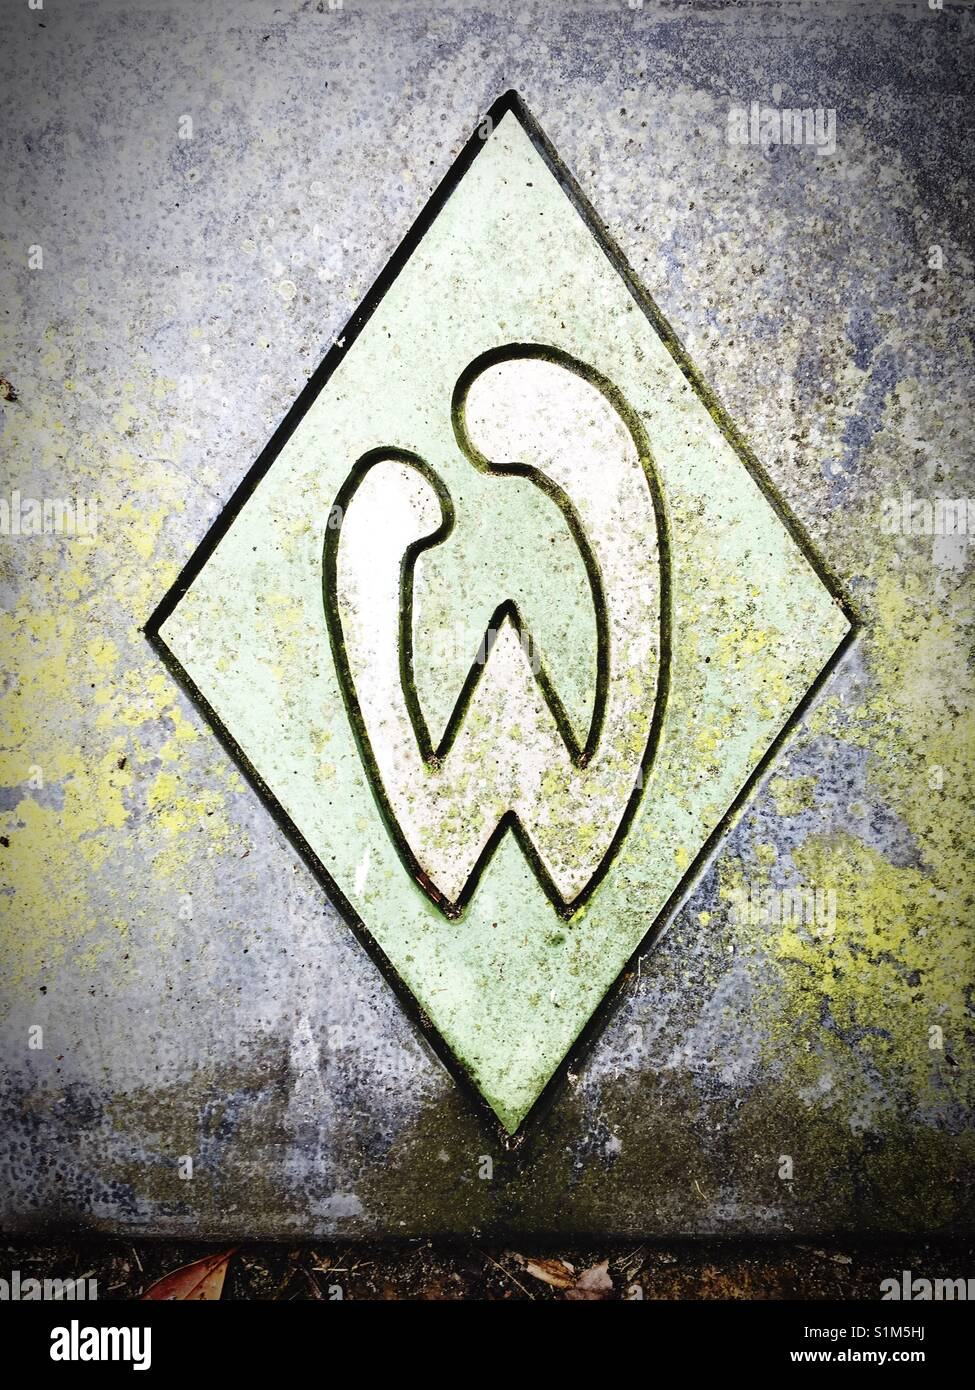 Beliebt Bevorzugt Football Logo Werder Bremen Stock Photos & Football Logo Werder #ED_15